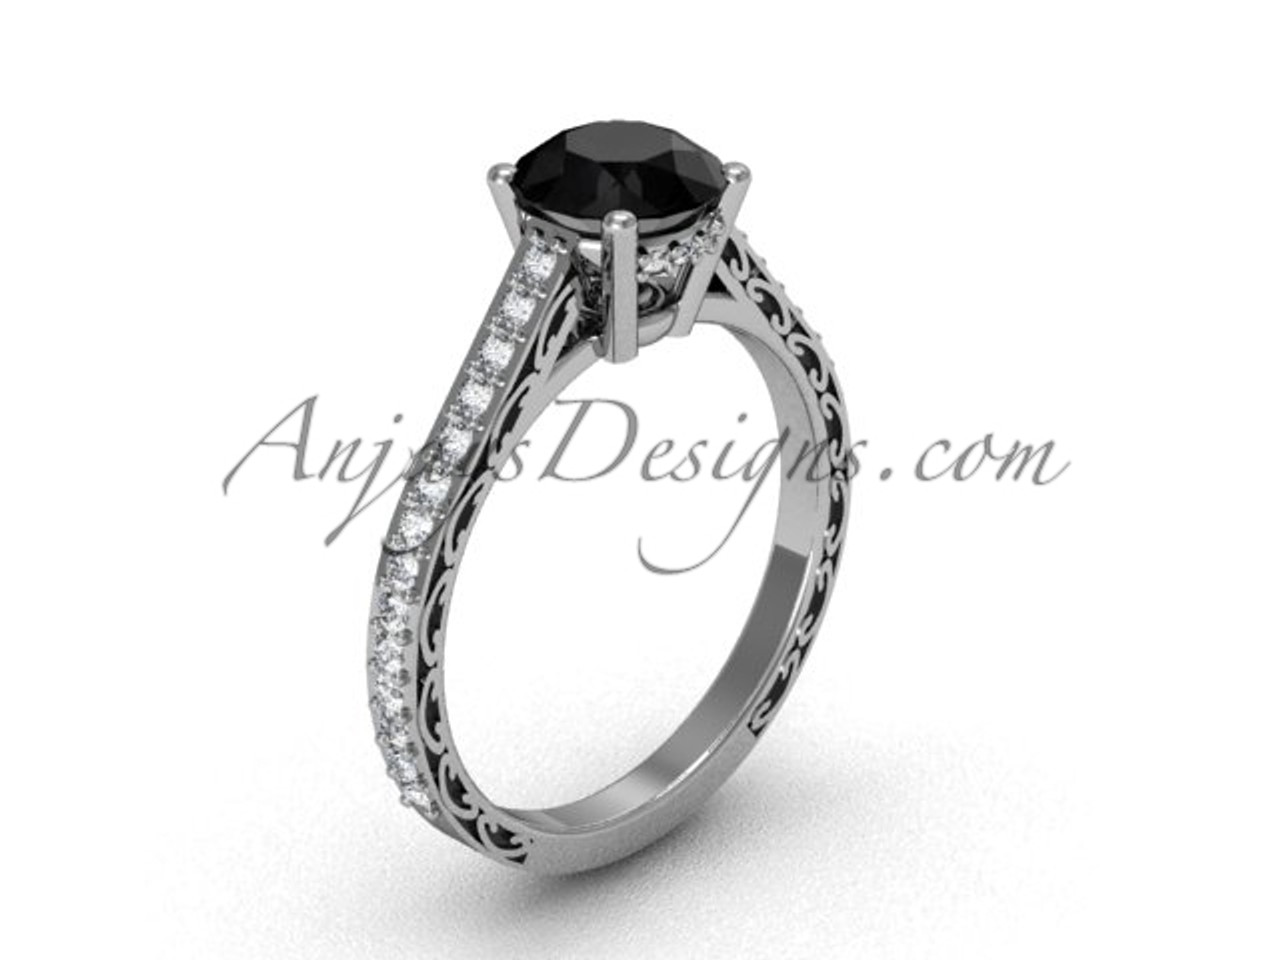 Vintage Sgt618 Gold Unique Black Ring Wedding White Diamond Engagement Rings14k yvmNPn08wO